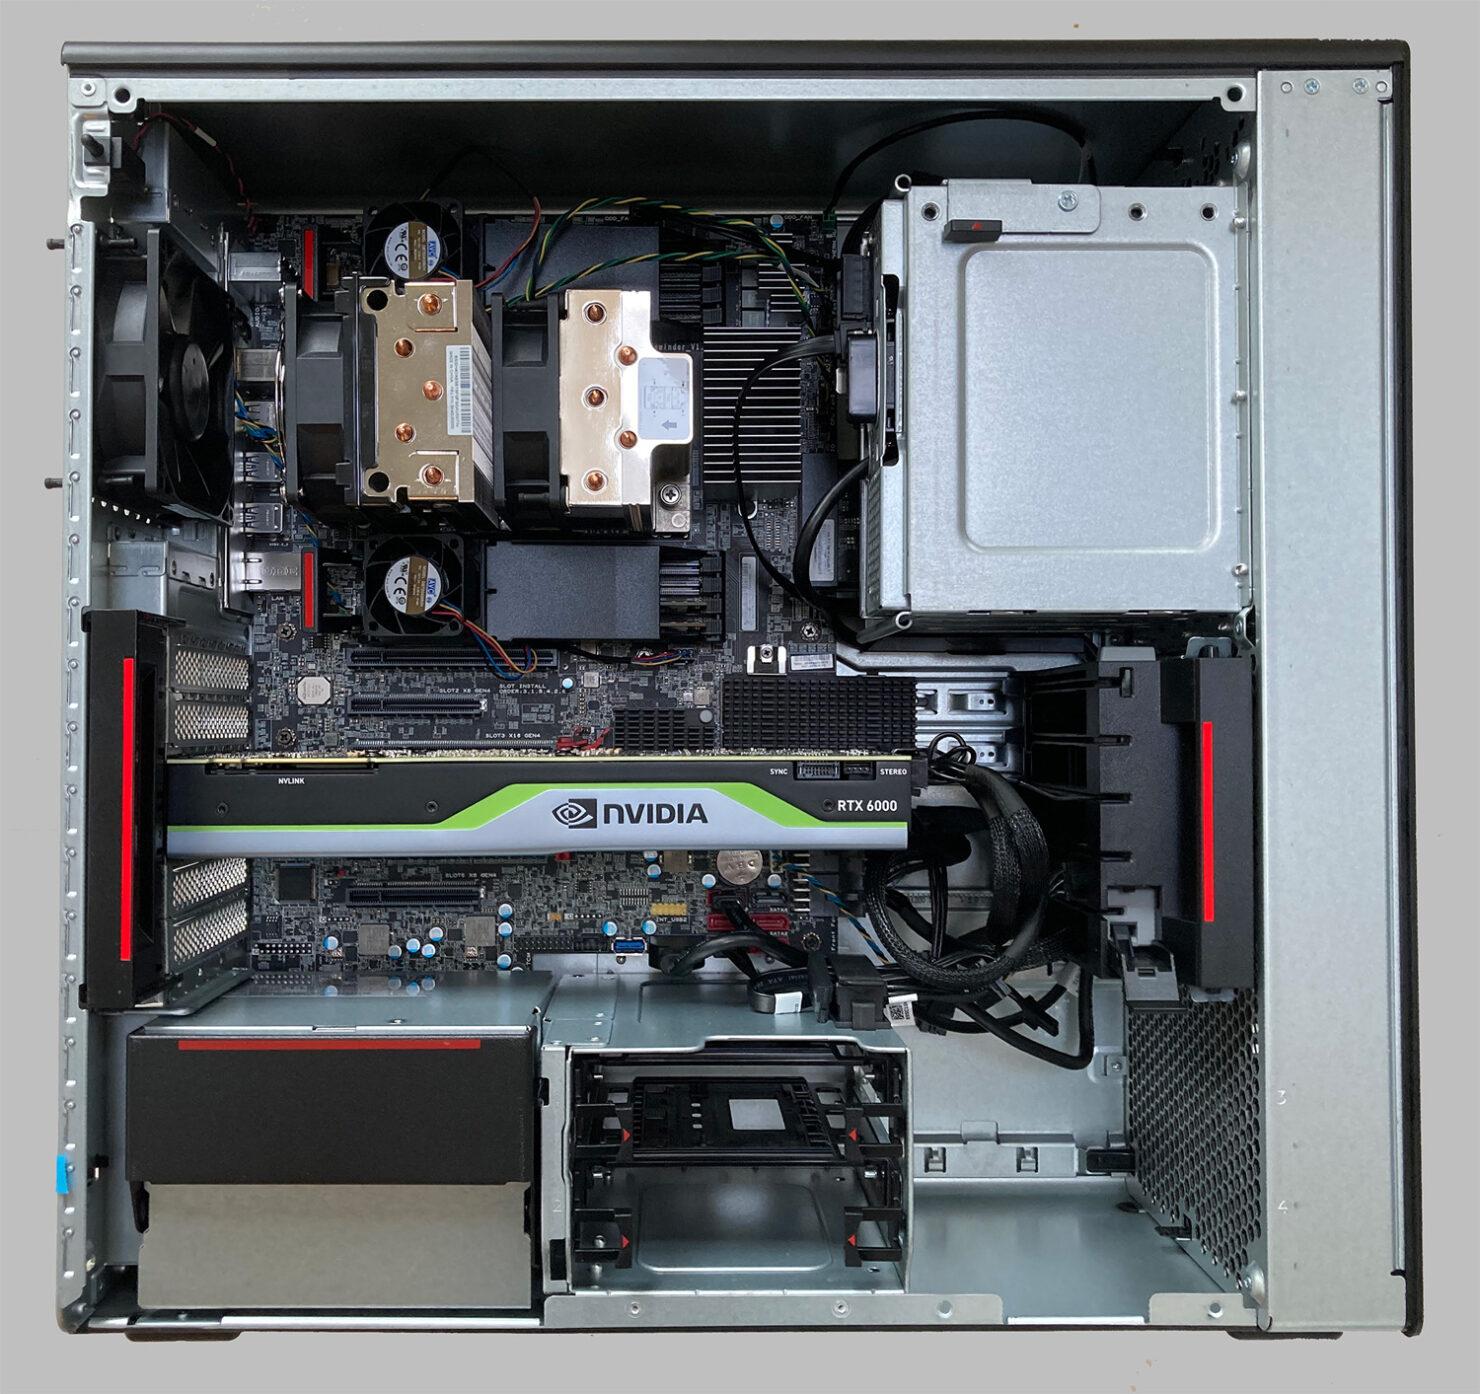 lenovo-thinkstation-p620-workstation-with-amd-ryzen-threadripper-pro-wrx80-platform-_3